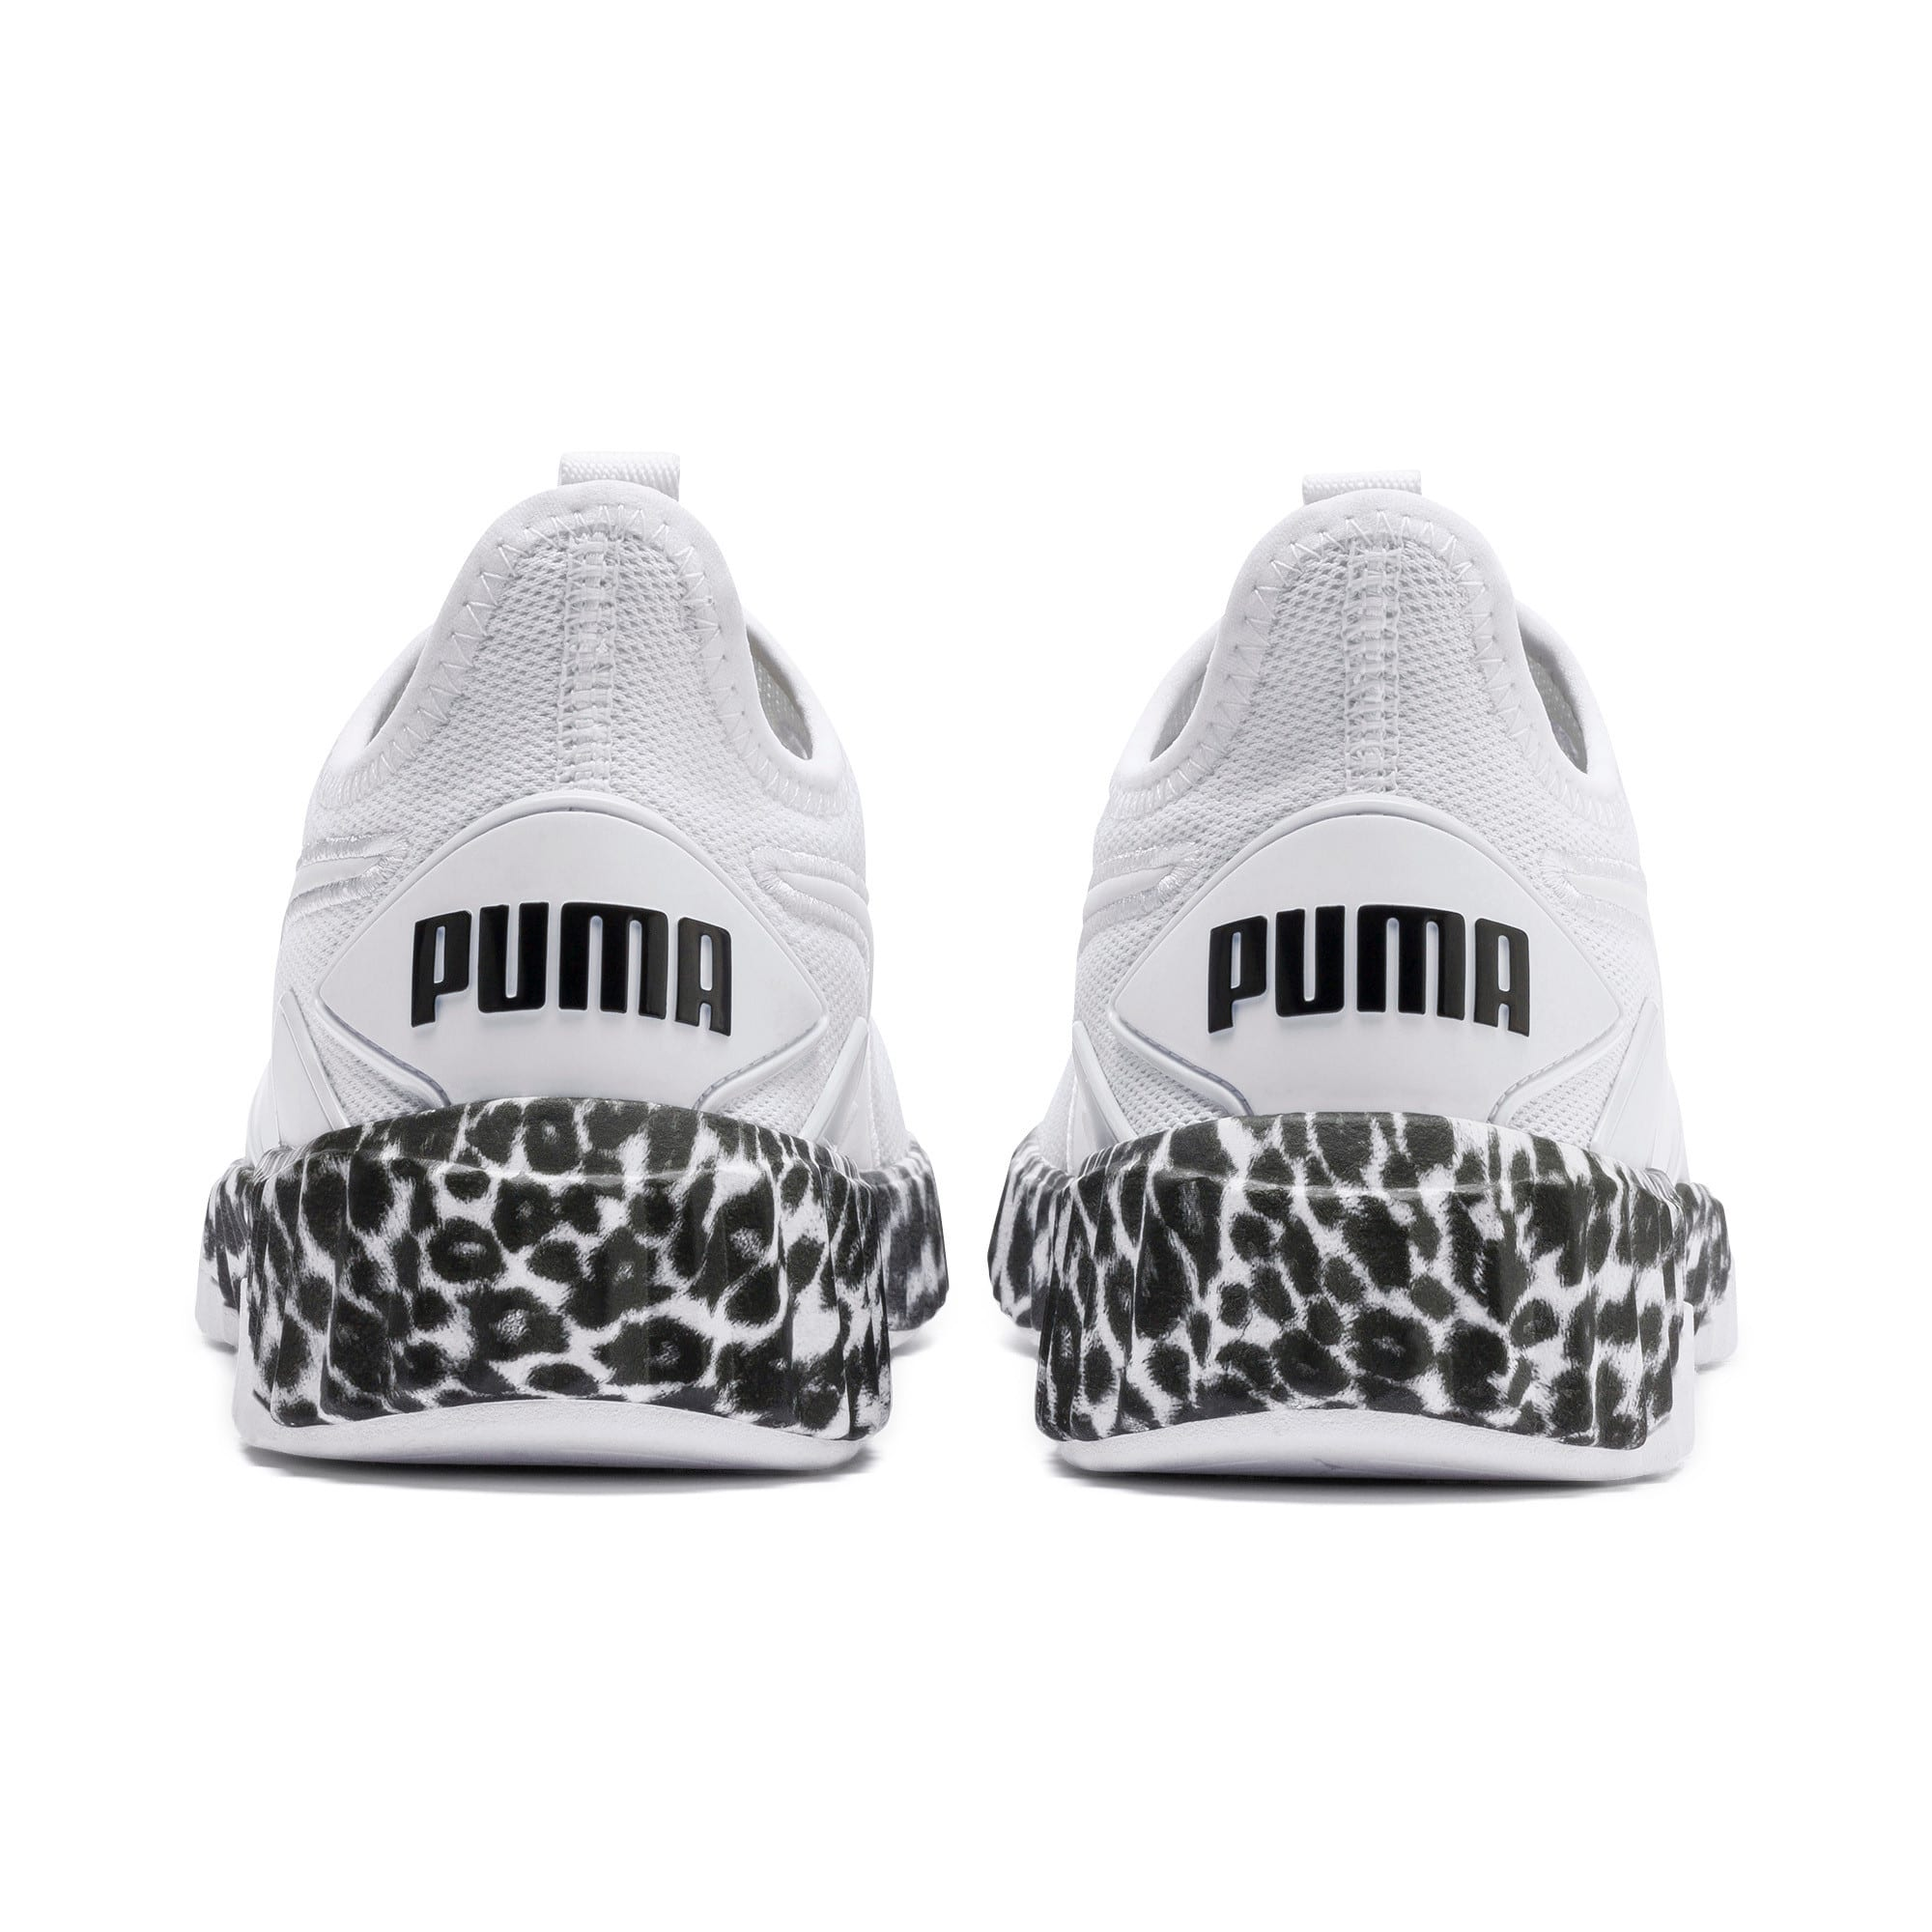 Thumbnail 4 of Defy Leopard Women's Sneakers, Puma White-Puma Black, medium